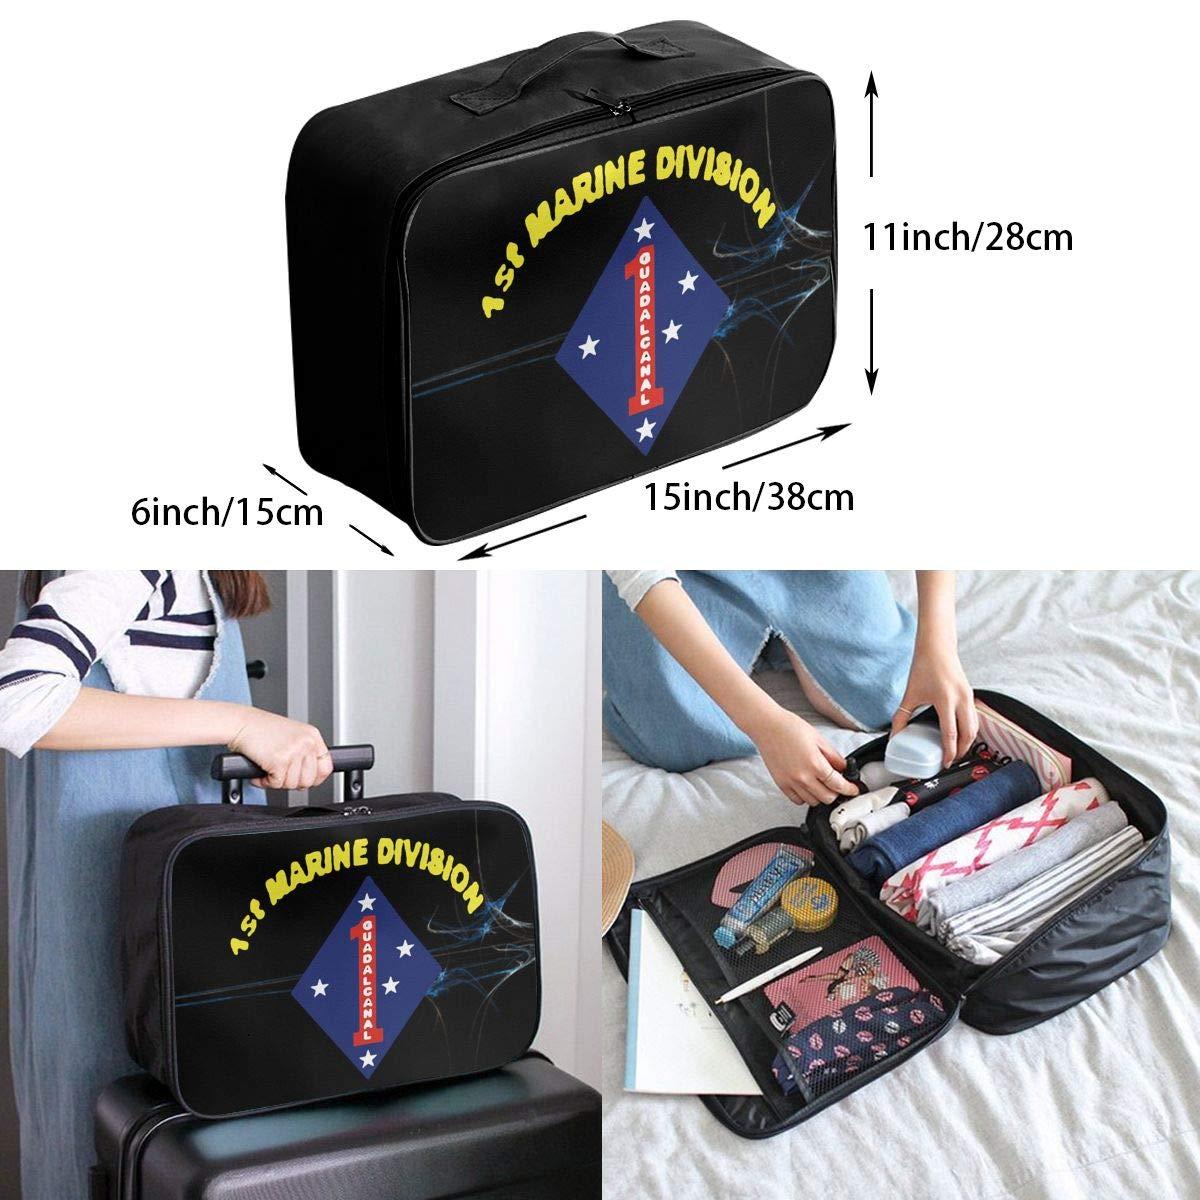 Unisex Travel Duffel Bag Waterproof Fashion Lightweight Large Capacity Portable Luggage Bag US 1st Marine Division